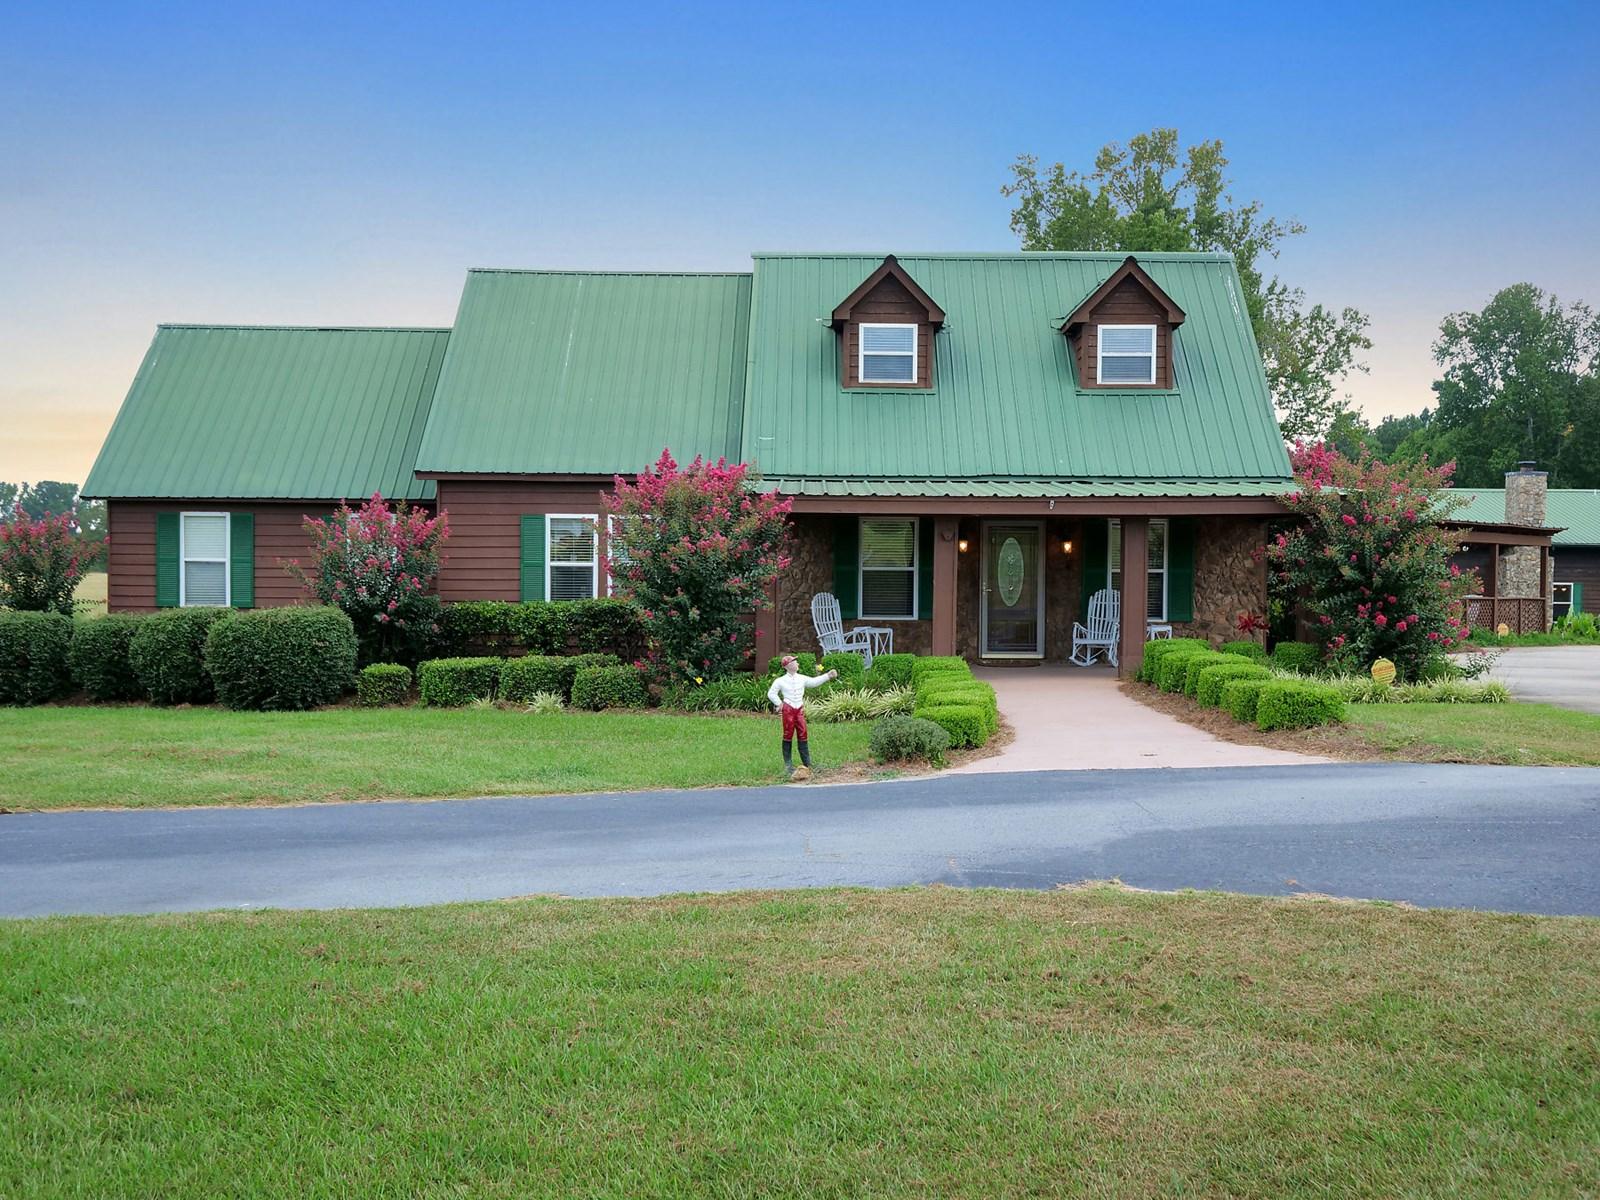 52-Acre Country Estate, Farm & Resort in Warren County, GA